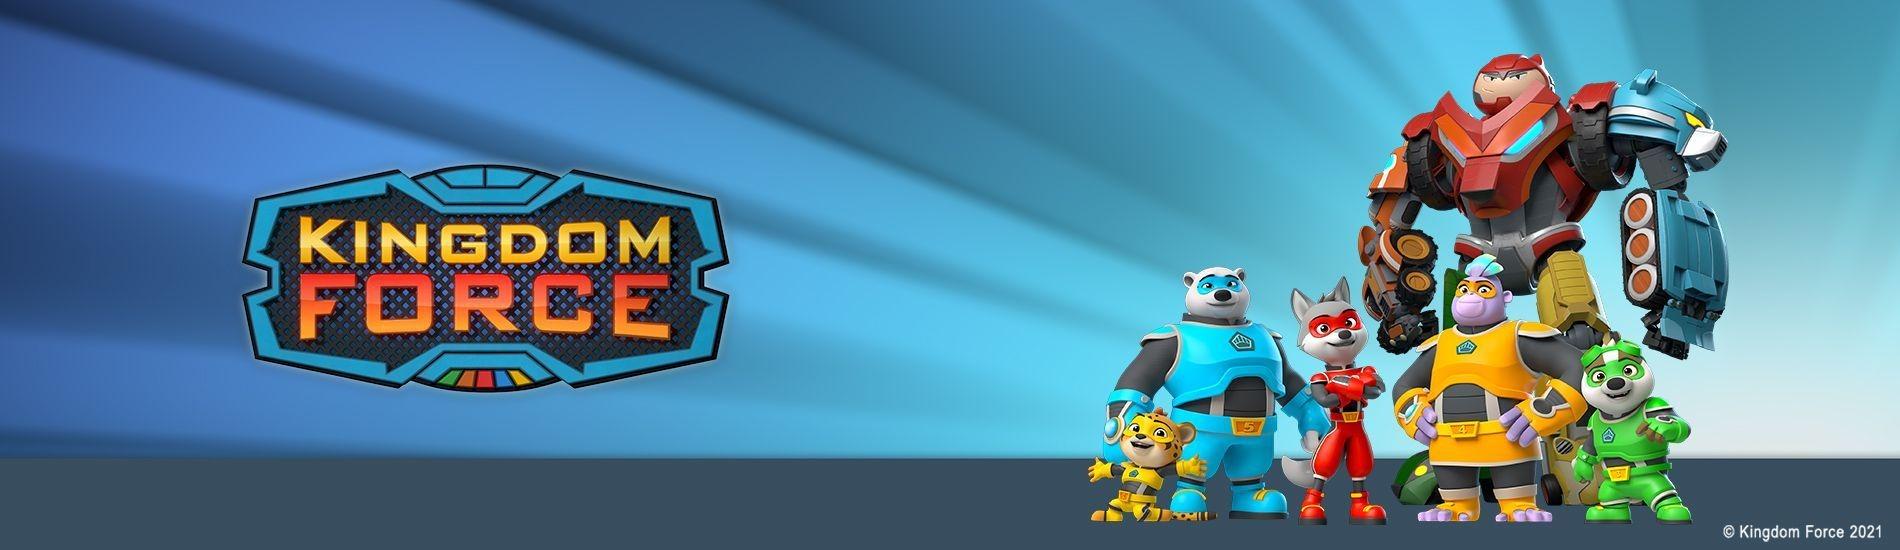 Kingdom Force en streaming sur Gulli Replay